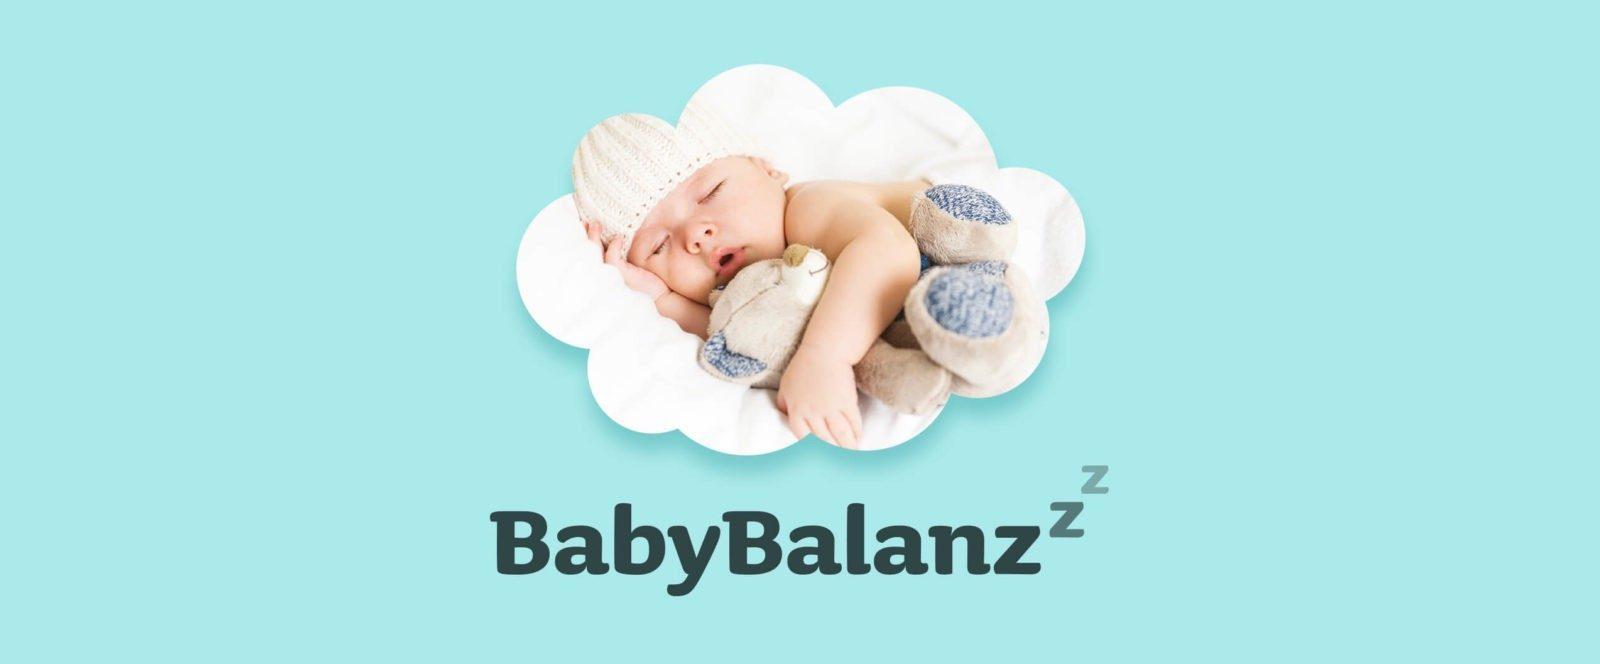 Sirope-Proyectos-Deki-Babybalanz-foto3